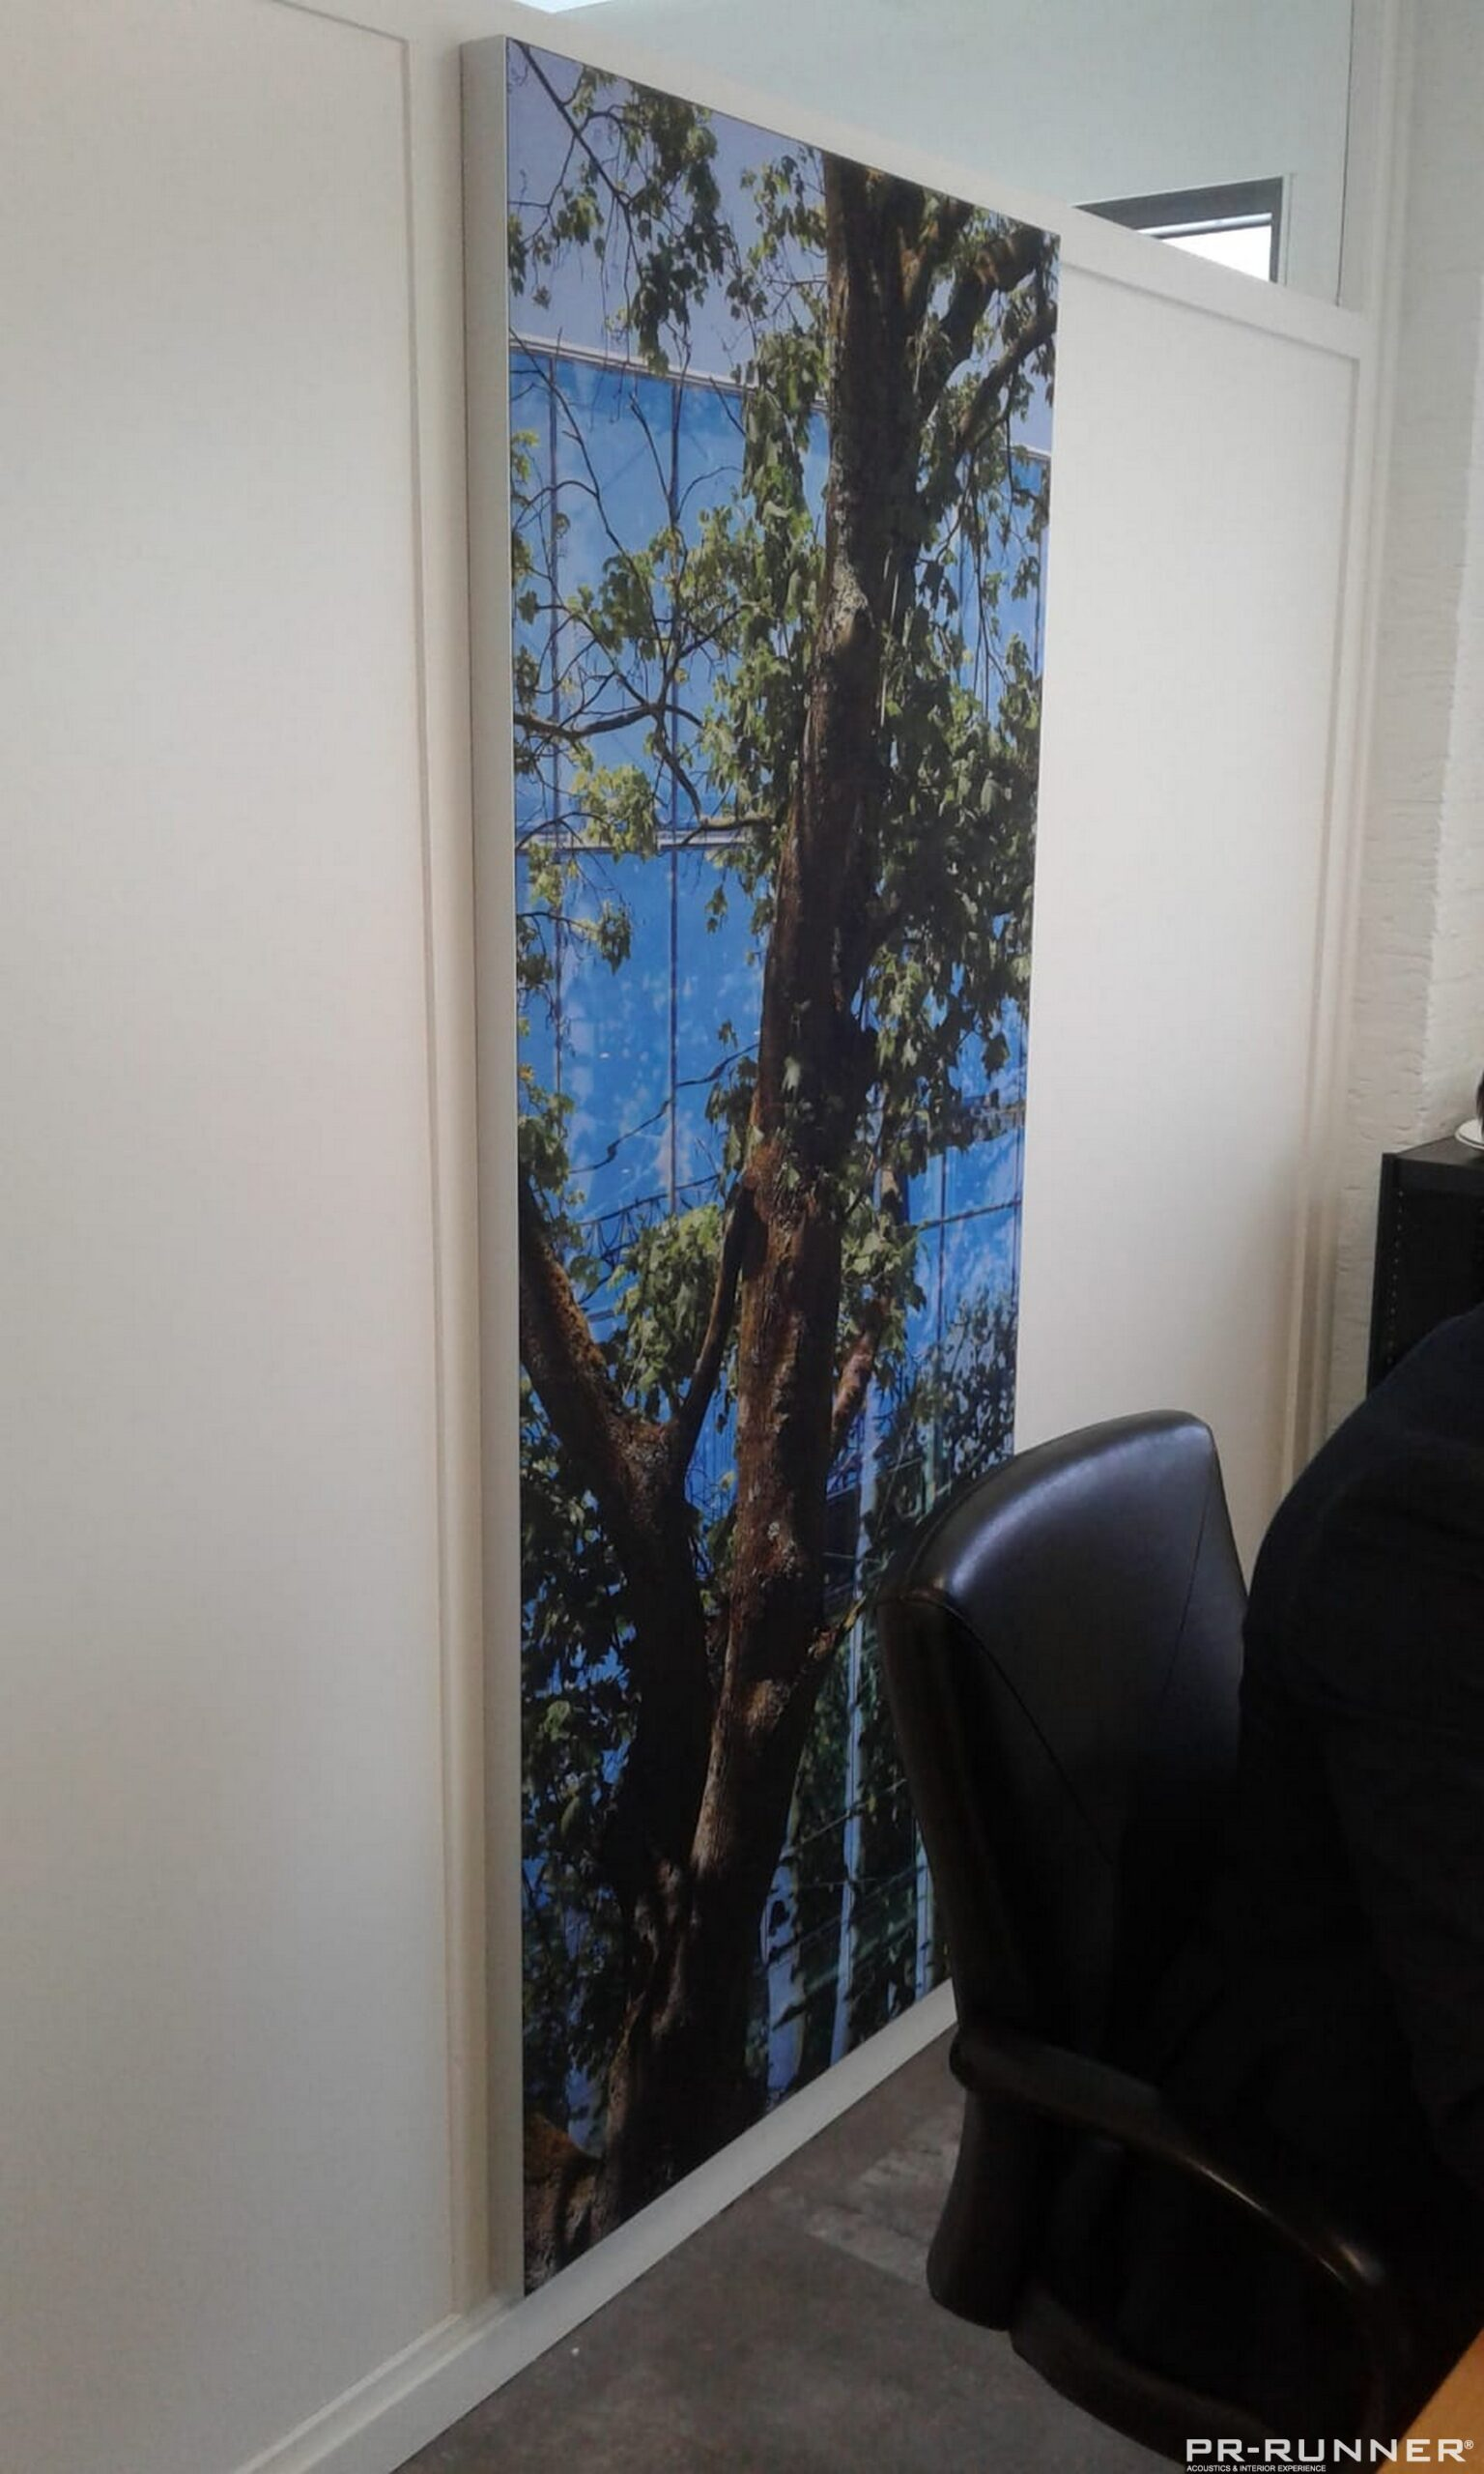 Fotopaneel akoestisch kantoorruimte PR-Runner